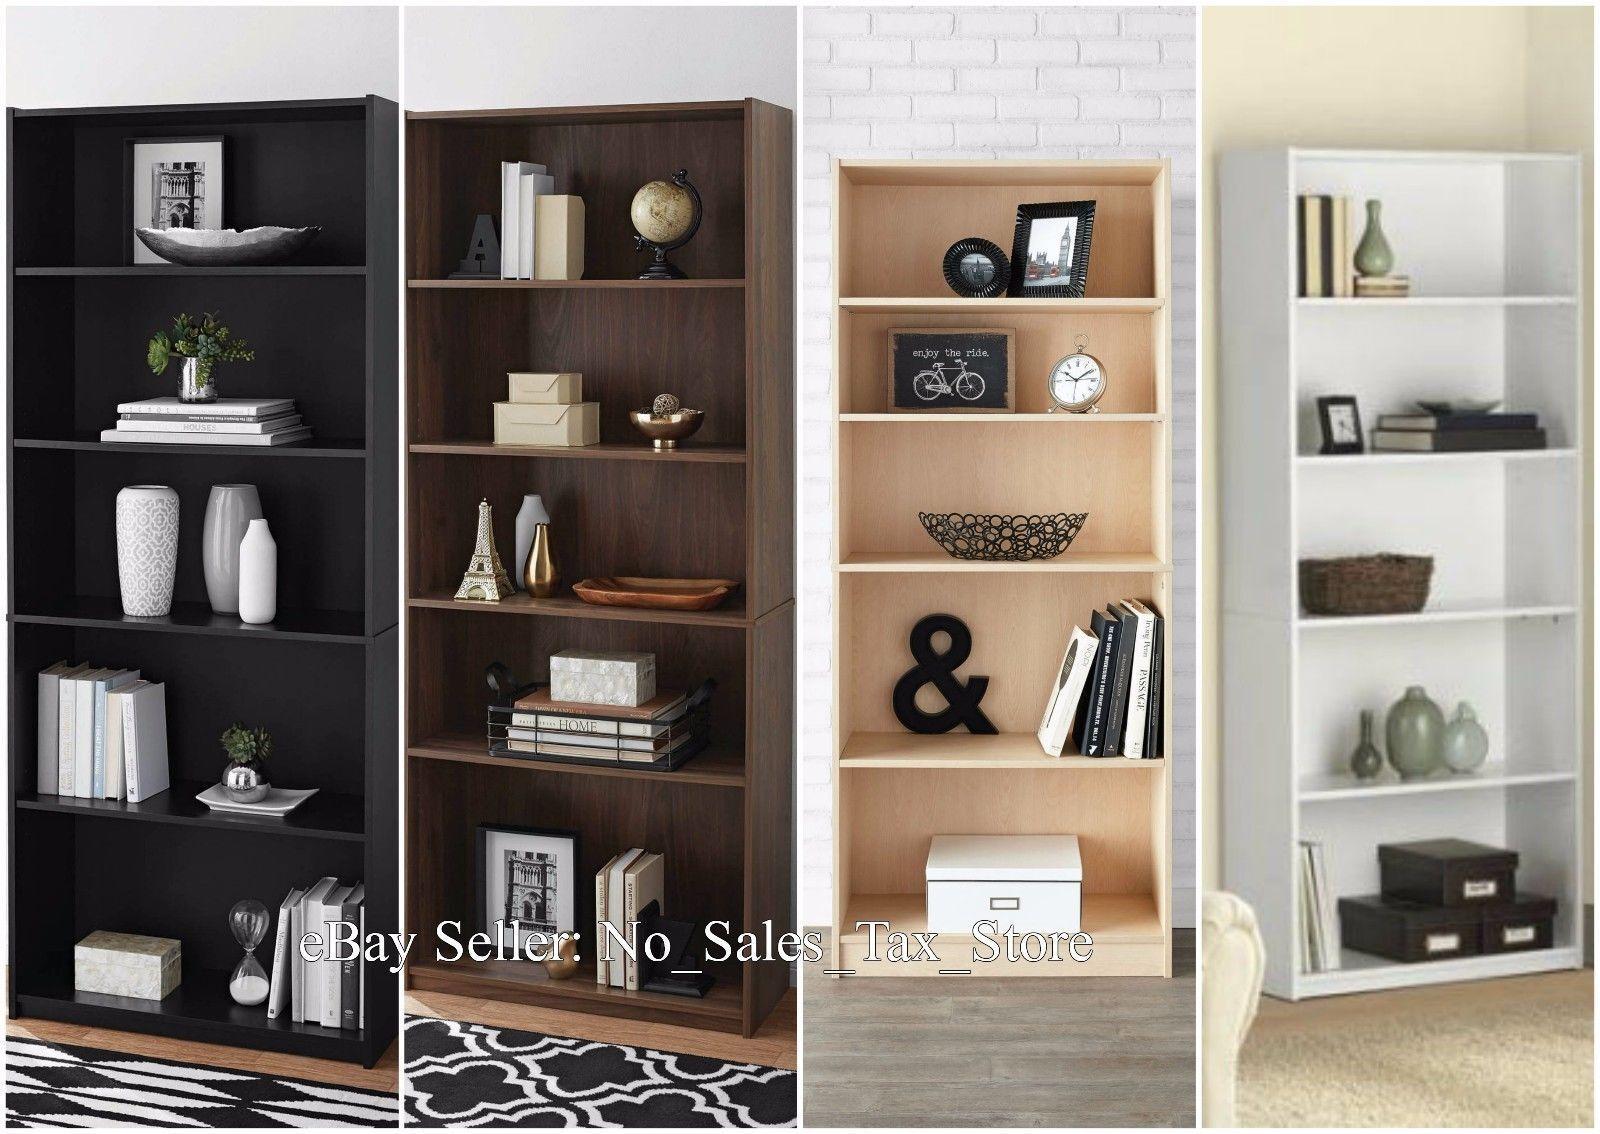 MAINSTAYS Adjustable 5 Shelf Wood Bookcase Storage Shelving Bookshelf Furniture Sale